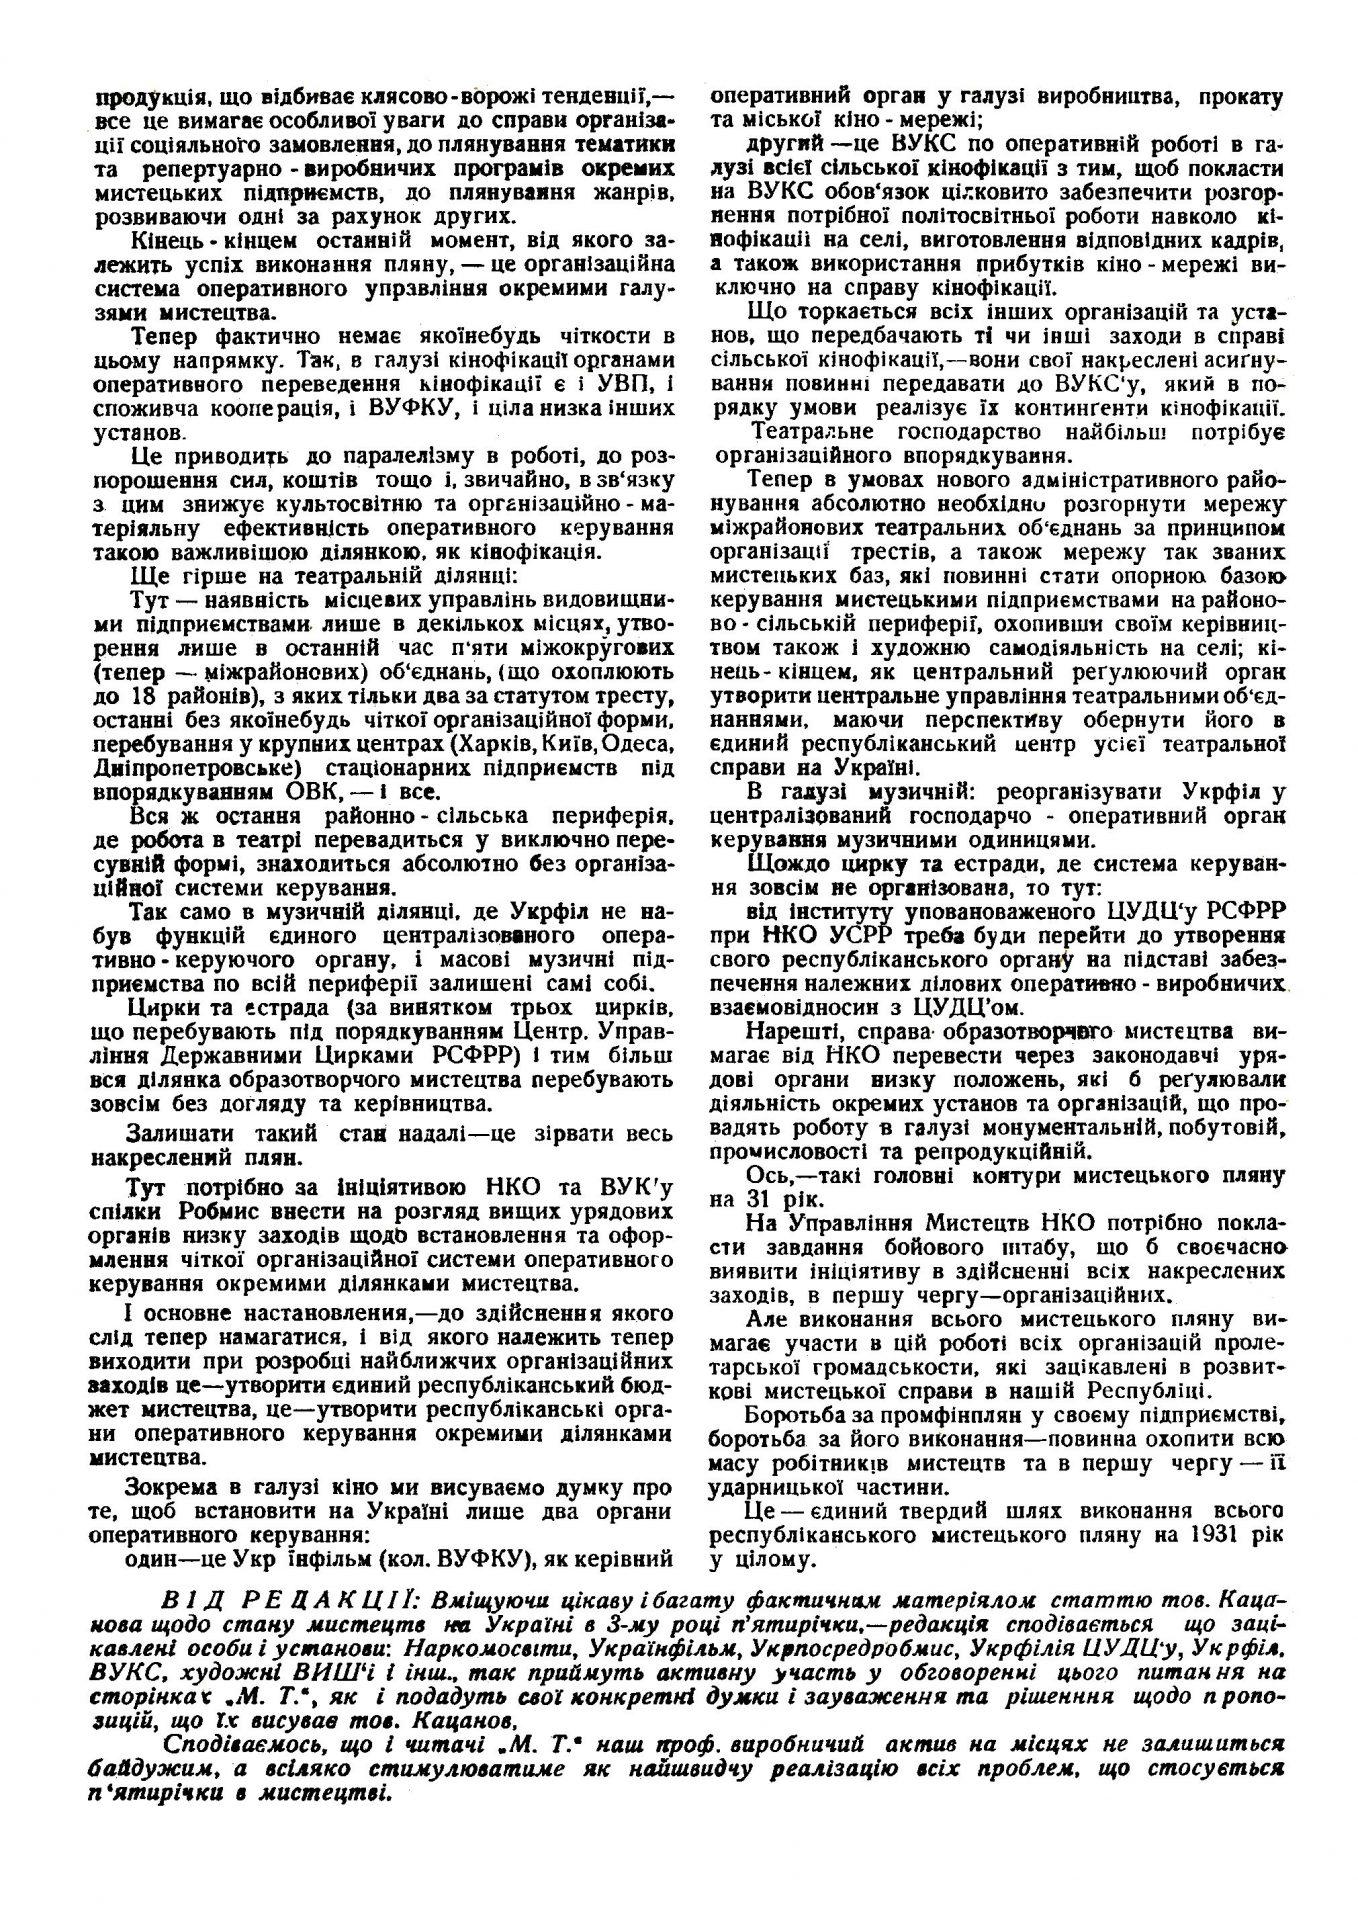 Мистецька трибуна_1930_№ 16